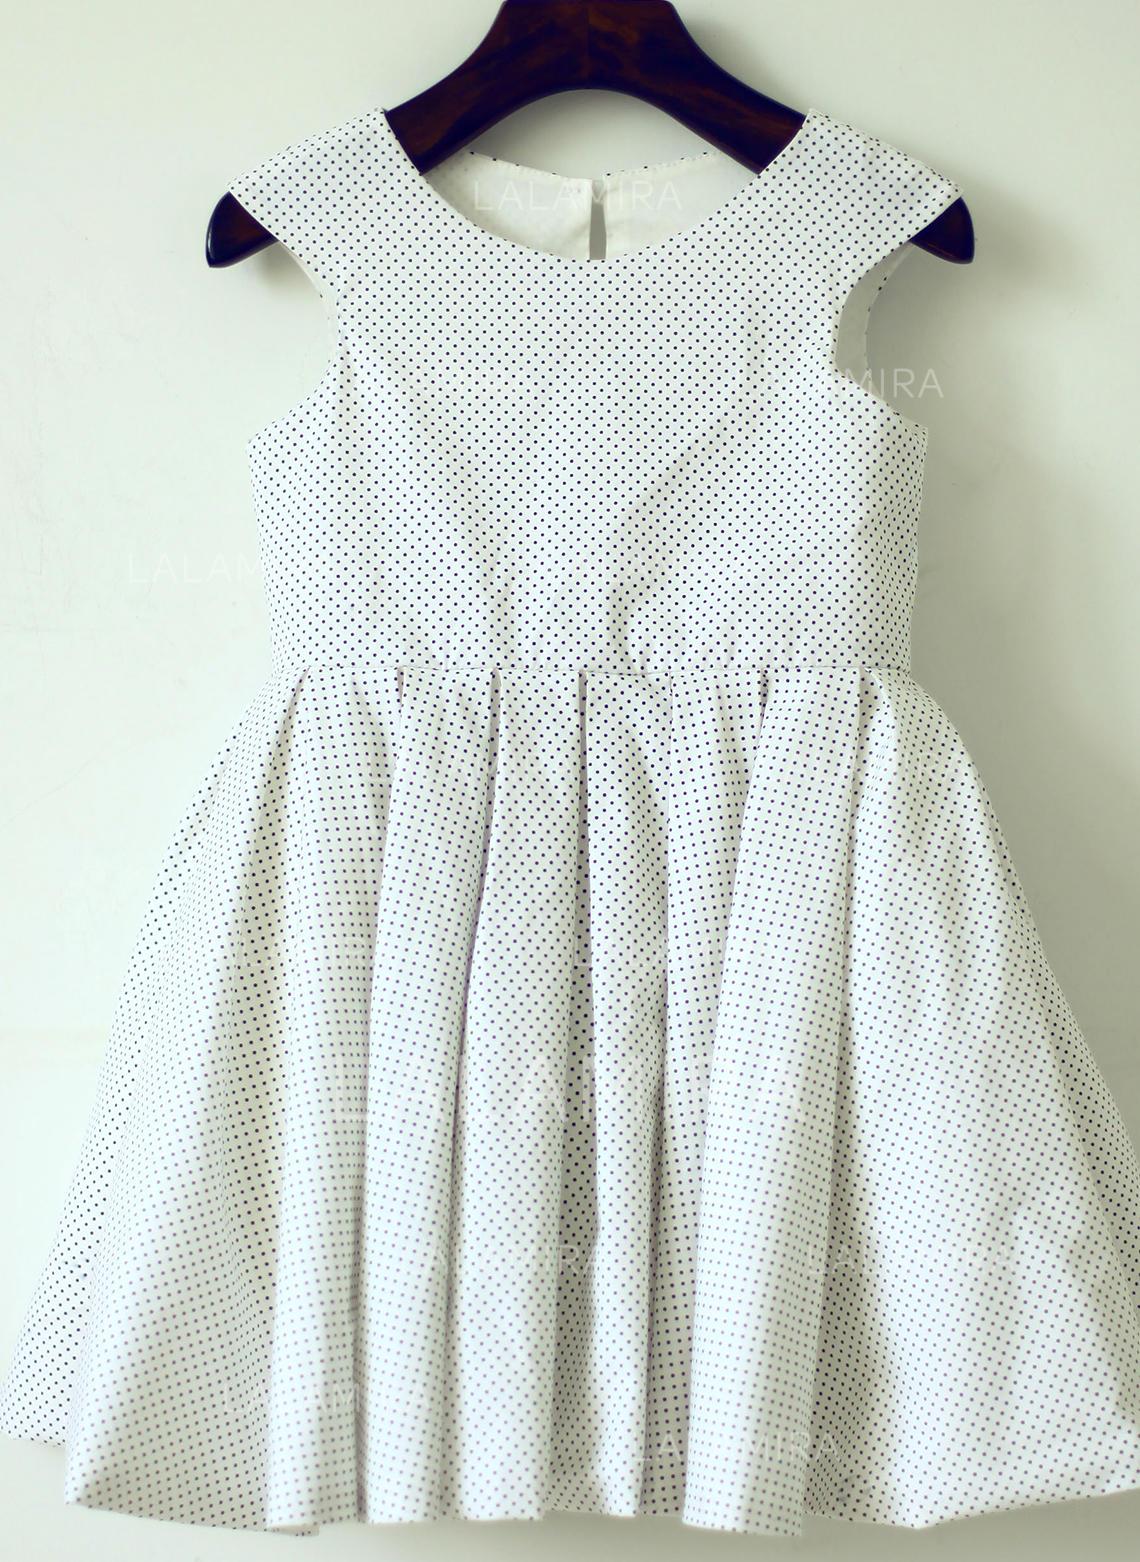 fad3e3315 Scoop Neck A-Line/Princess Flower Girl Dresses Back Hole Sleeveless  Knee-length. Loading zoom